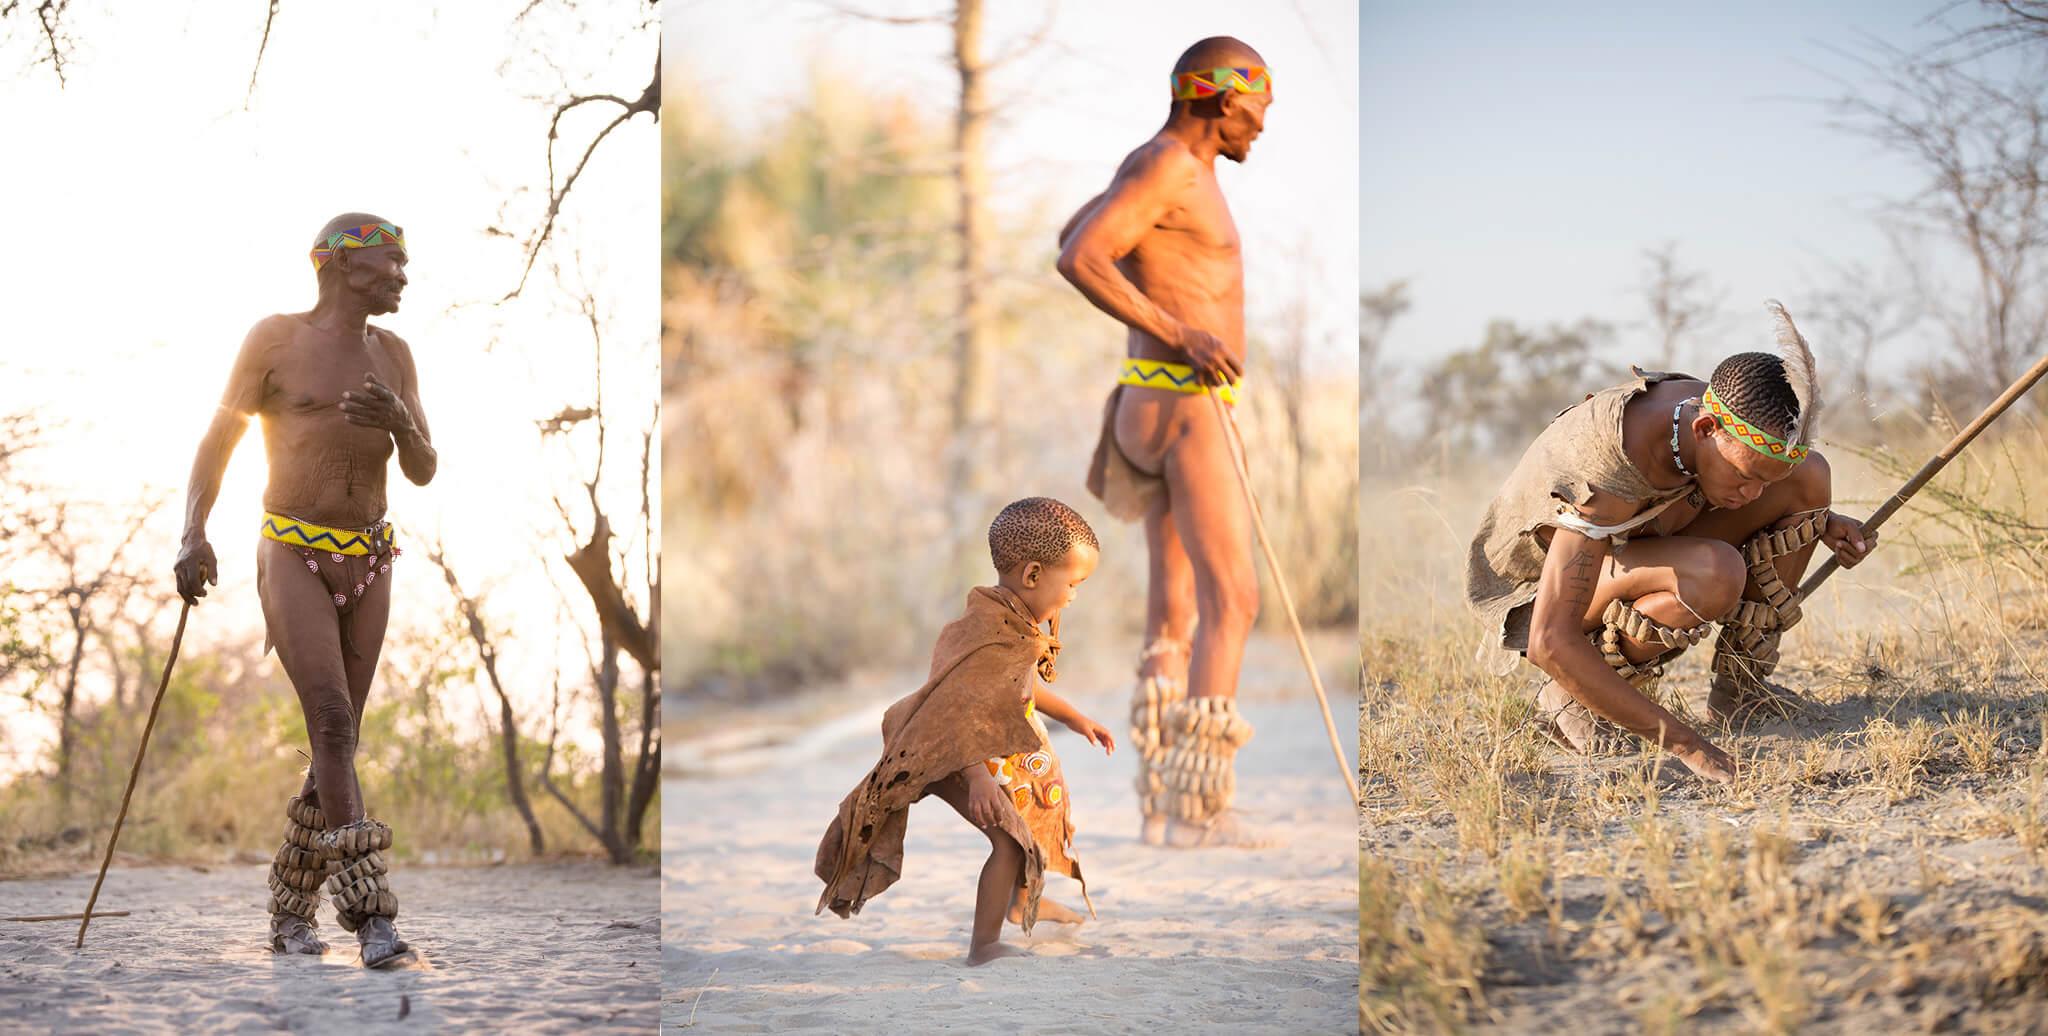 Jacks Camp, Botsuana